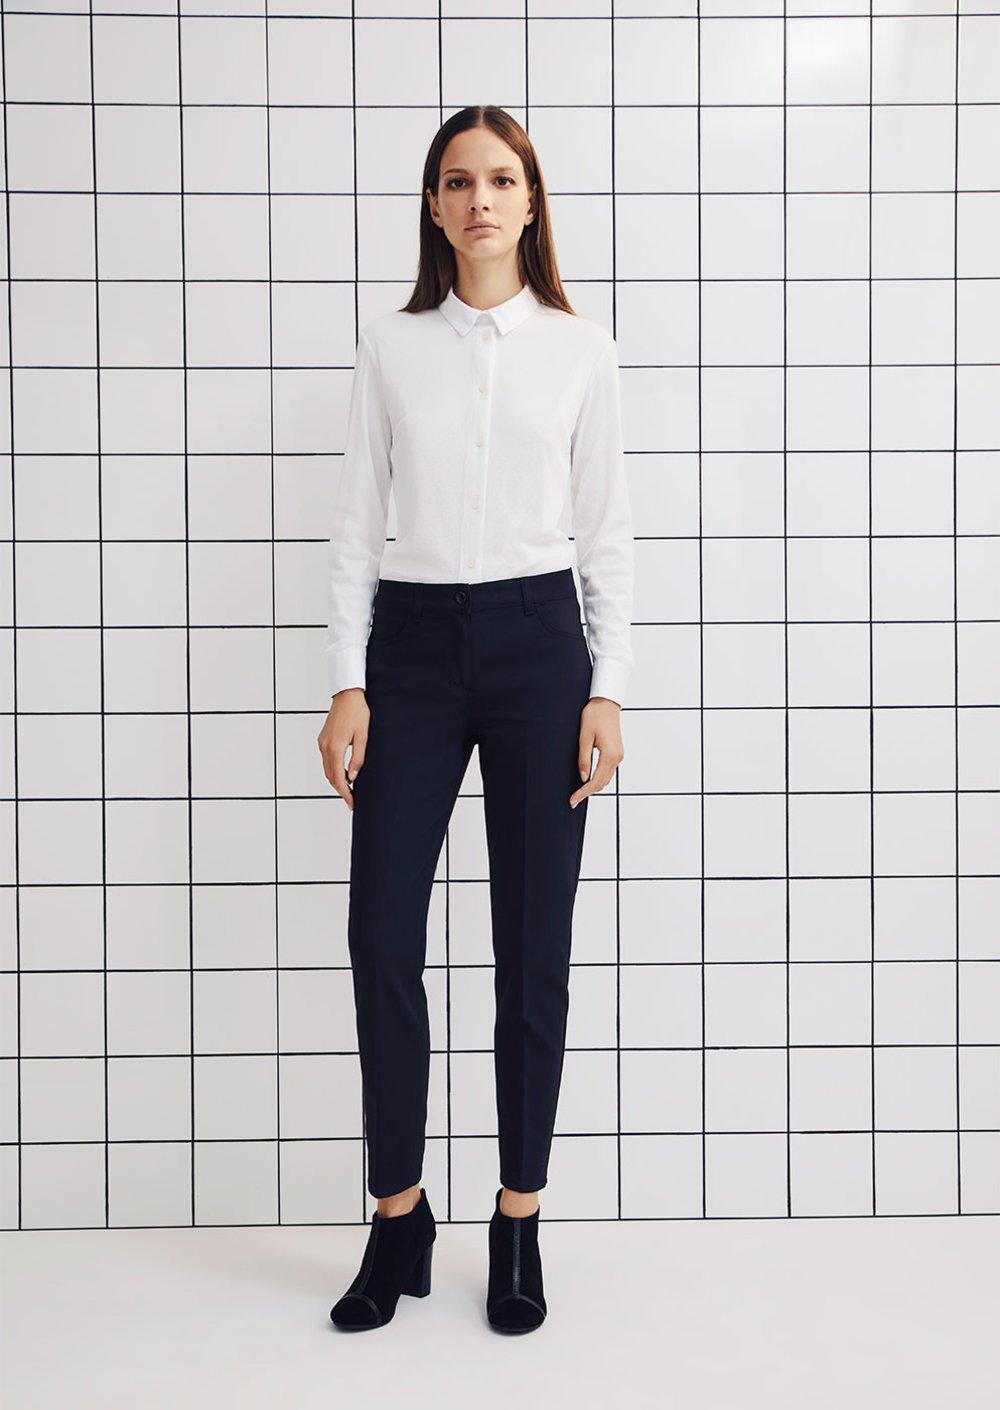 Pantalone Kate modello skinny - Black - Donna